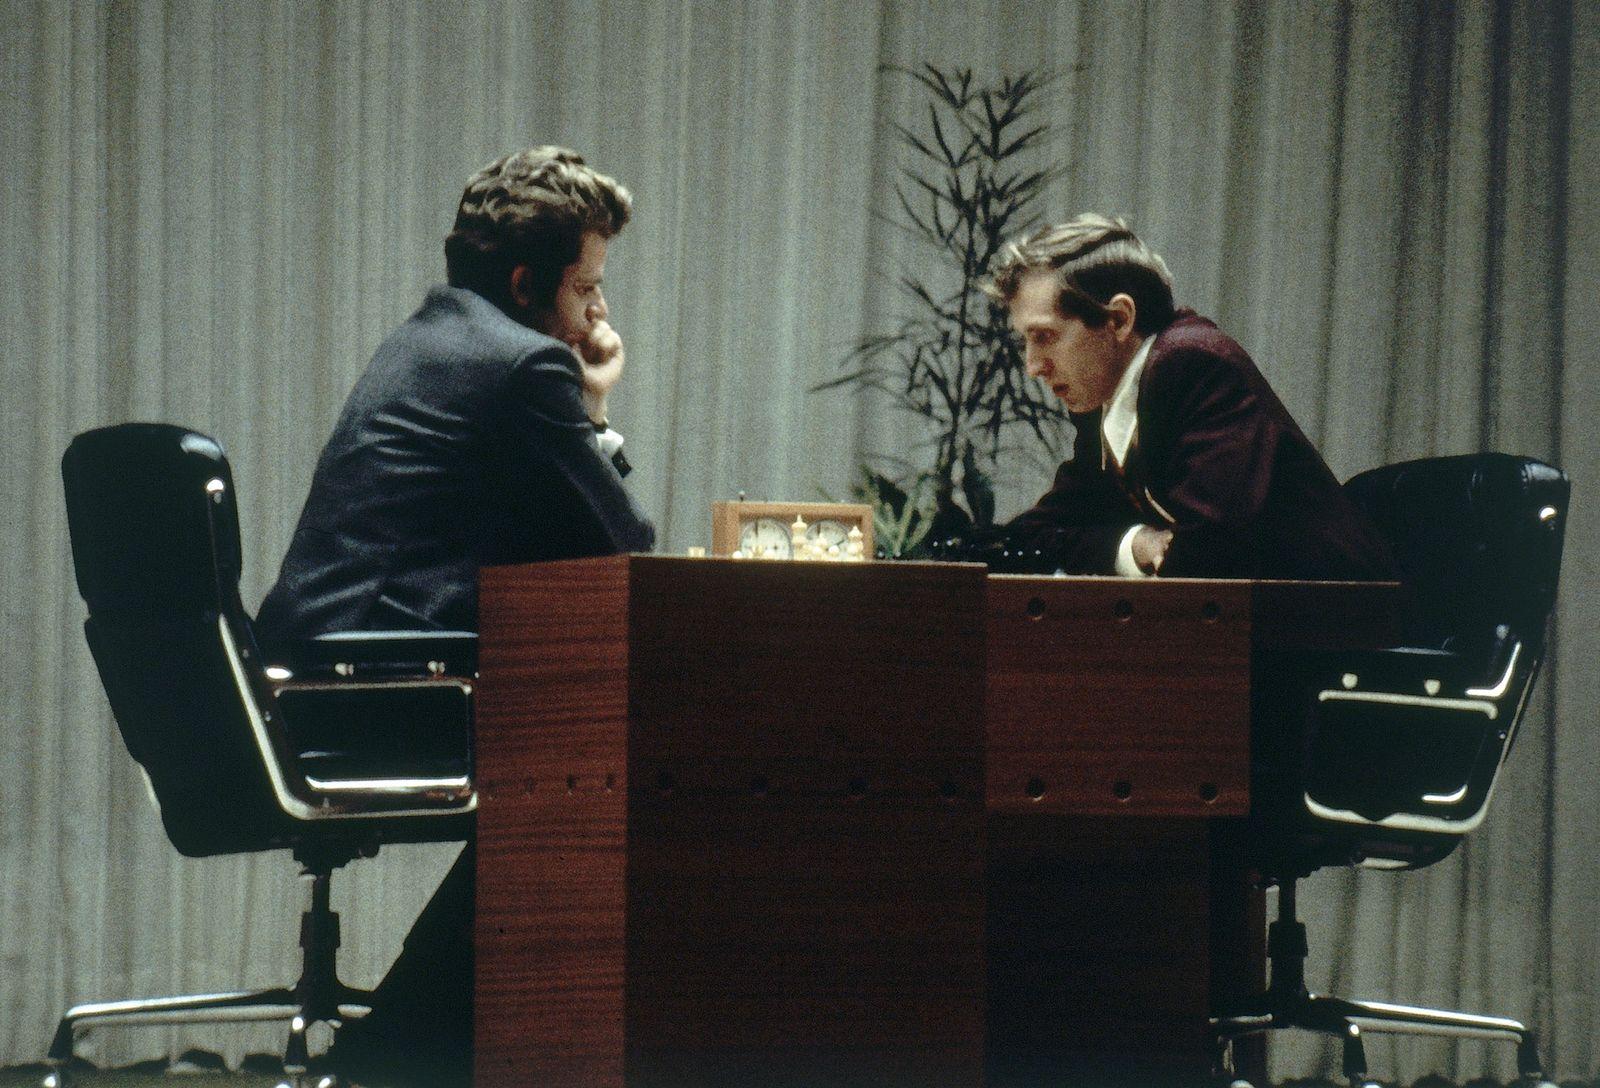 Bobby Fischer/ Boris Spassky 1972